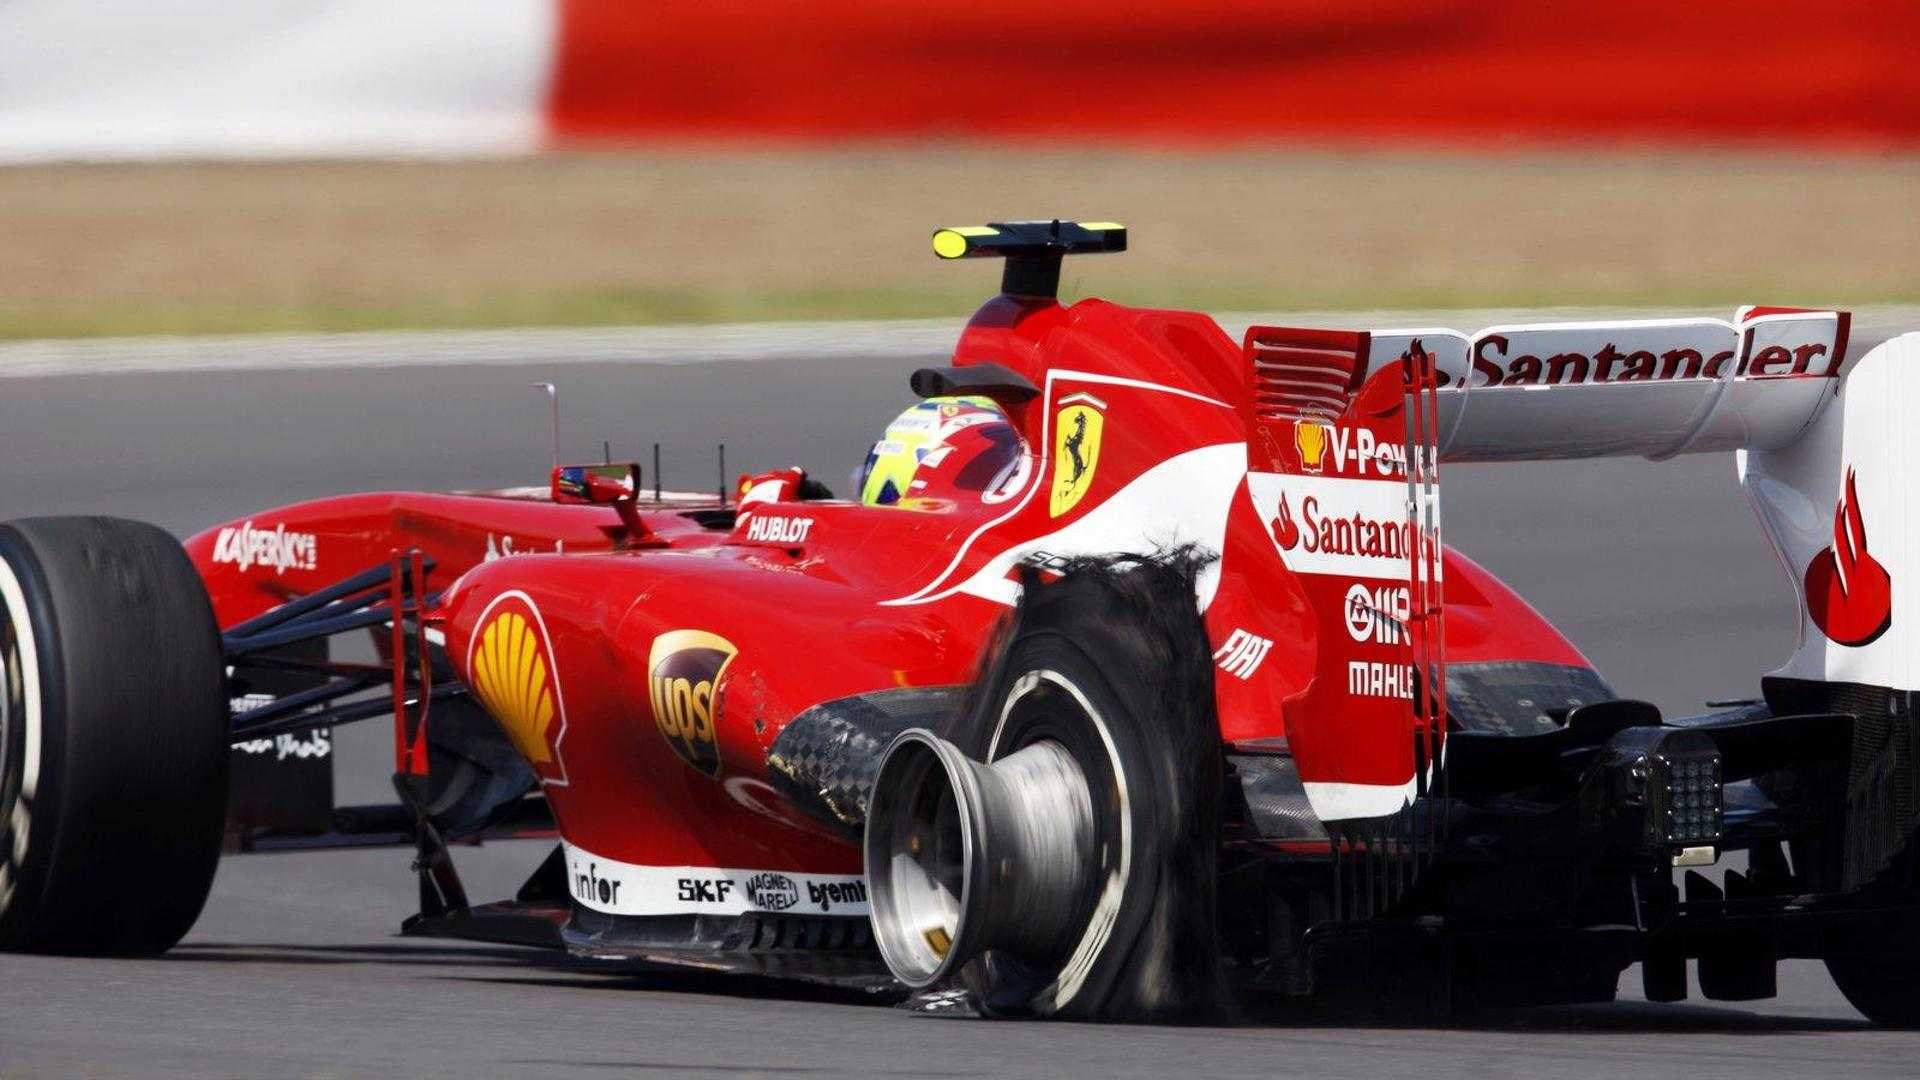 Alonso's Pirelli criticism 'very nervous' - chairman